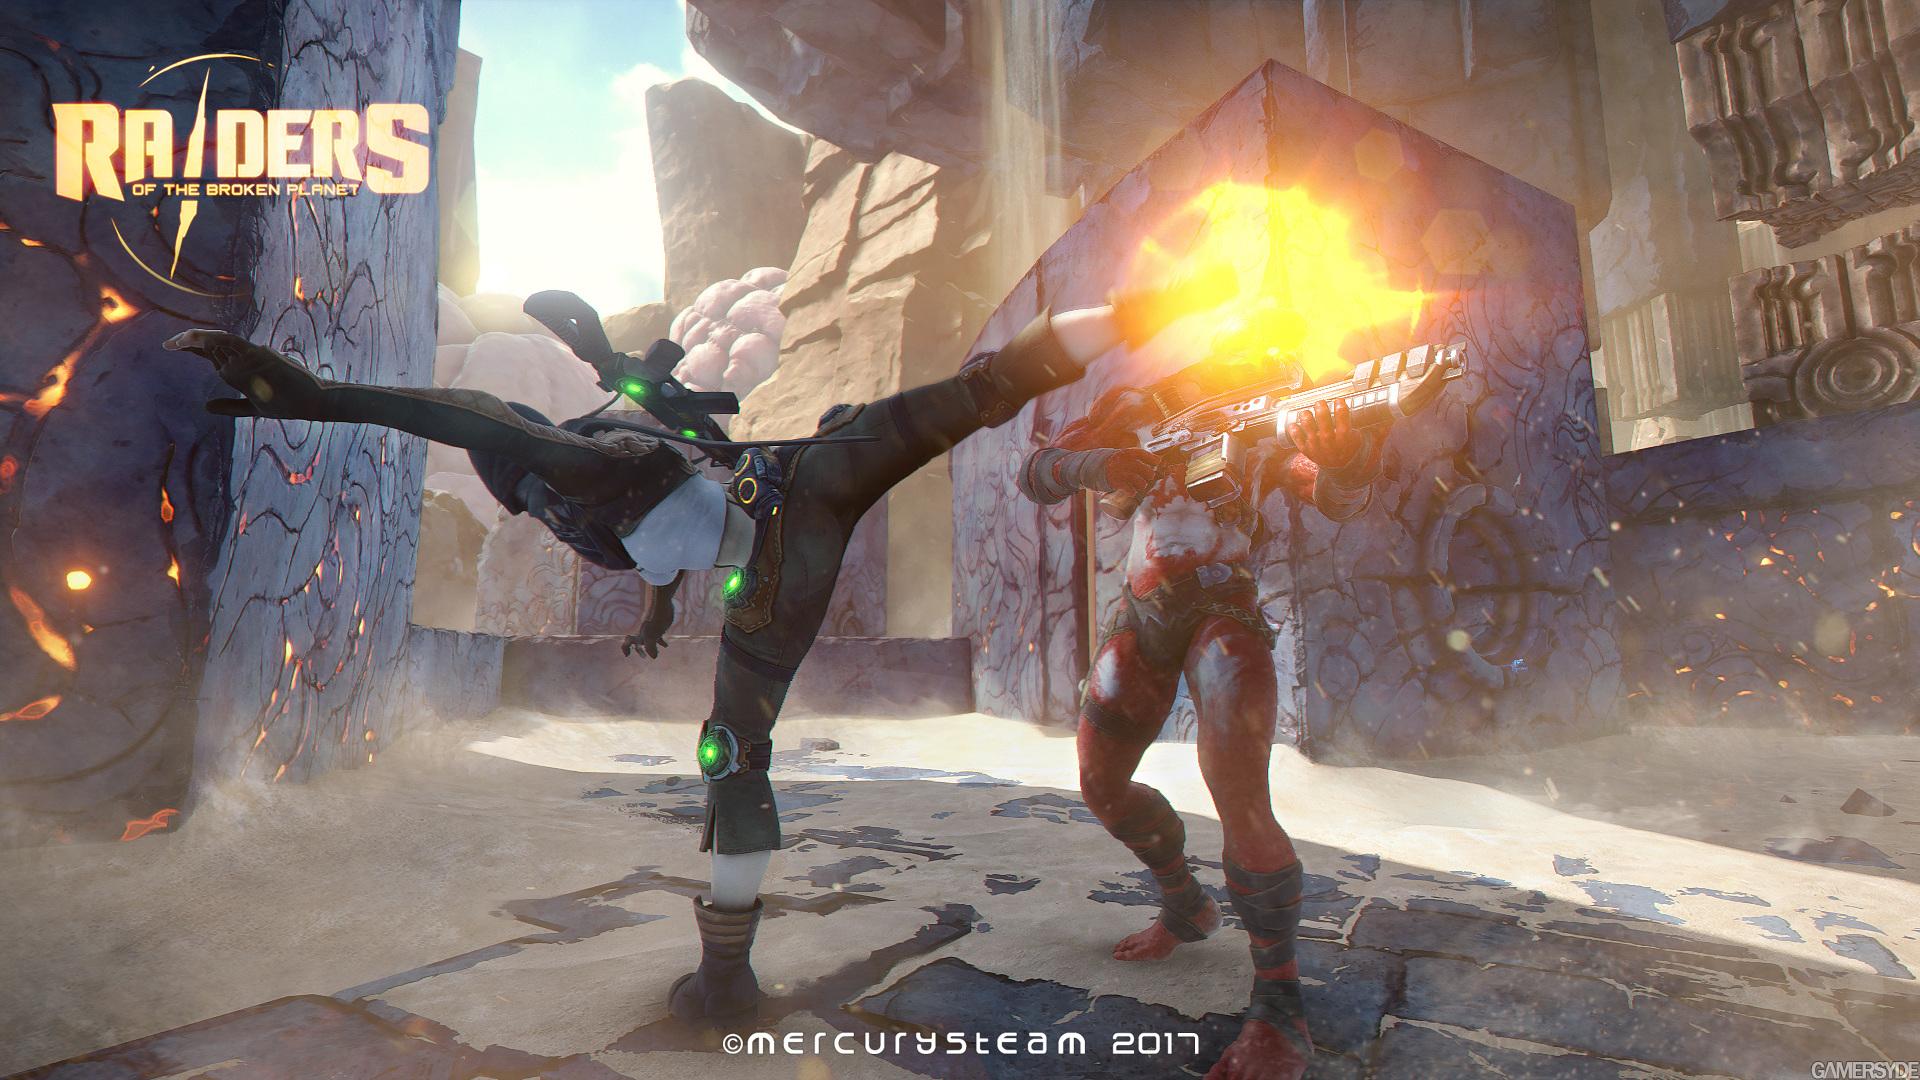 Raiders of the broken planet release date